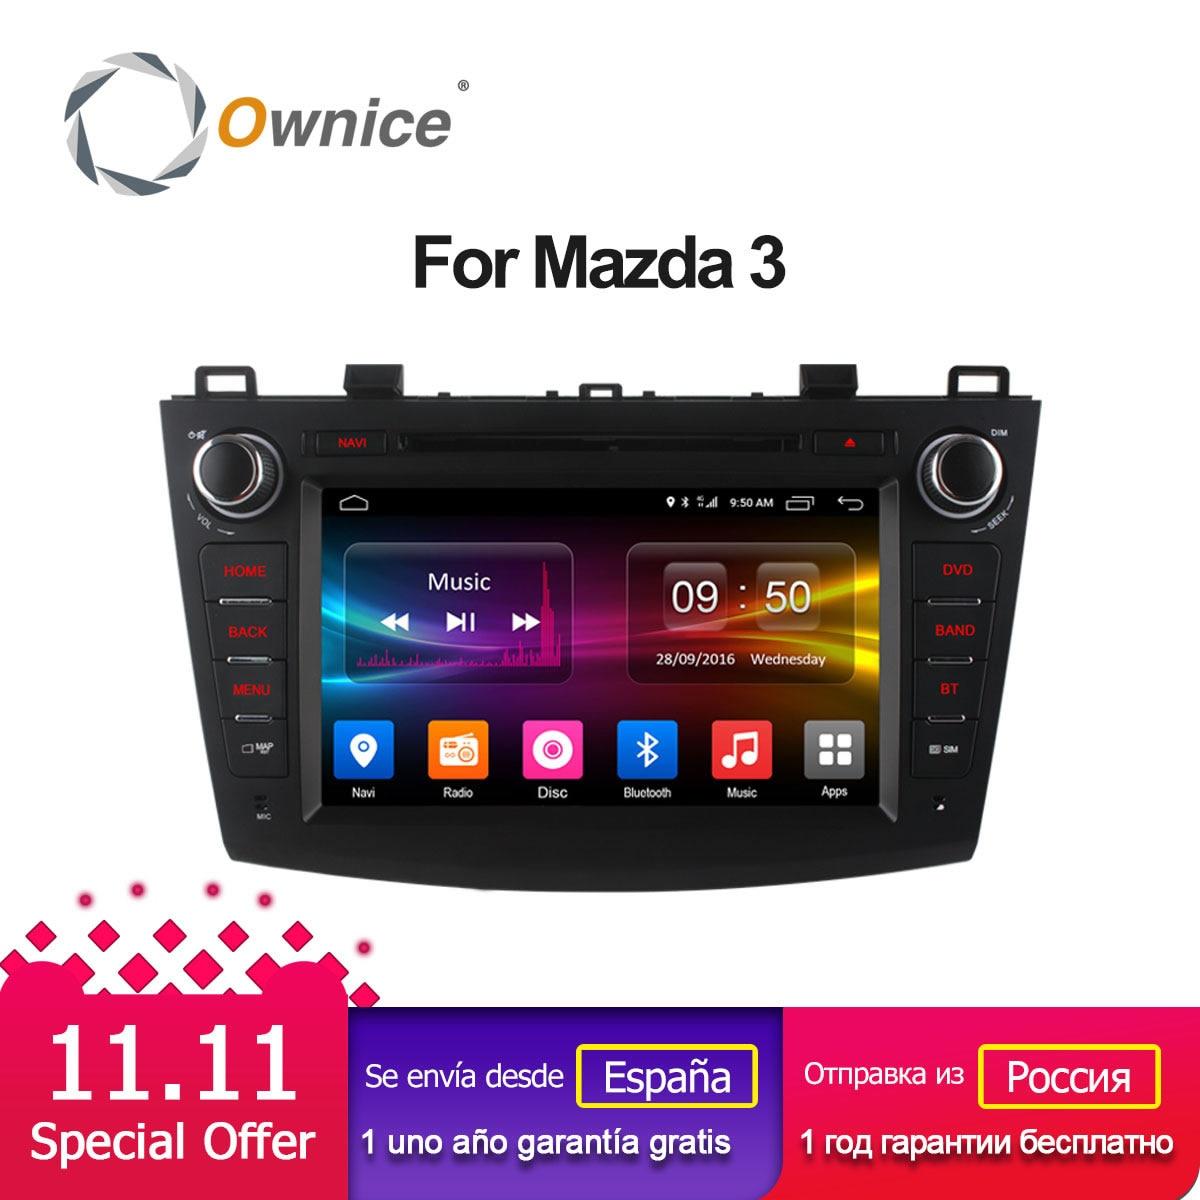 Ownice C500 Octa 8 Core Android 6.0 Car DVD player For Mazda 3 2008-2013 WIFI Radio GPS Navi OBD DVR 2GB RAM 32GB ROM Support 4G ownice c500 4g sim lte octa 8 core android 6 0 for kia ceed 2013 2015 car dvd player gps navi radio wifi 4g bt 2gb ram 32g rom